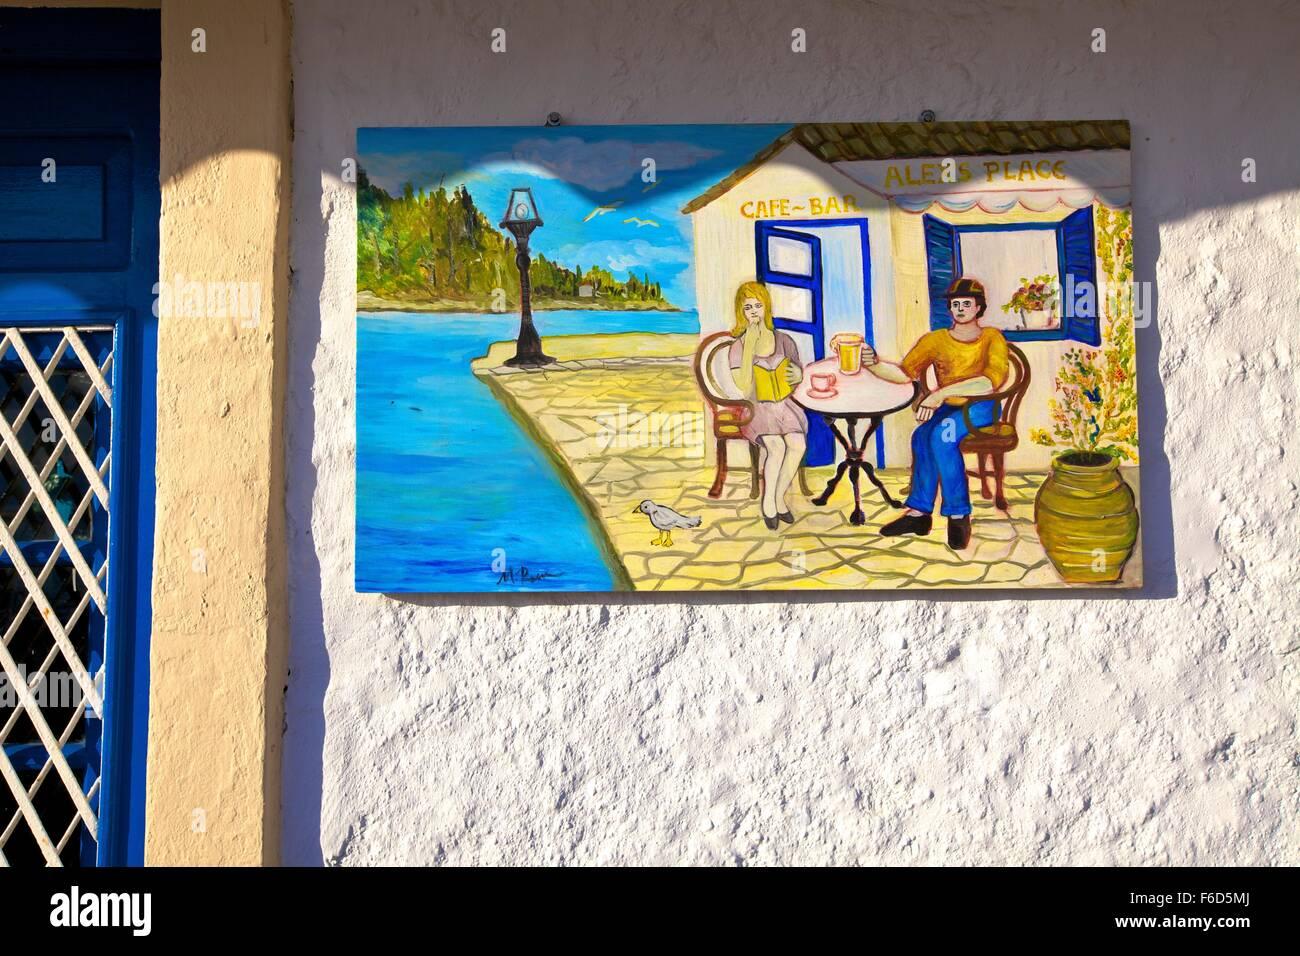 Restaurant Signage, Gaios, Paxos, The Ionian Islands, Greek Islands, Greece, Europe - Stock Image